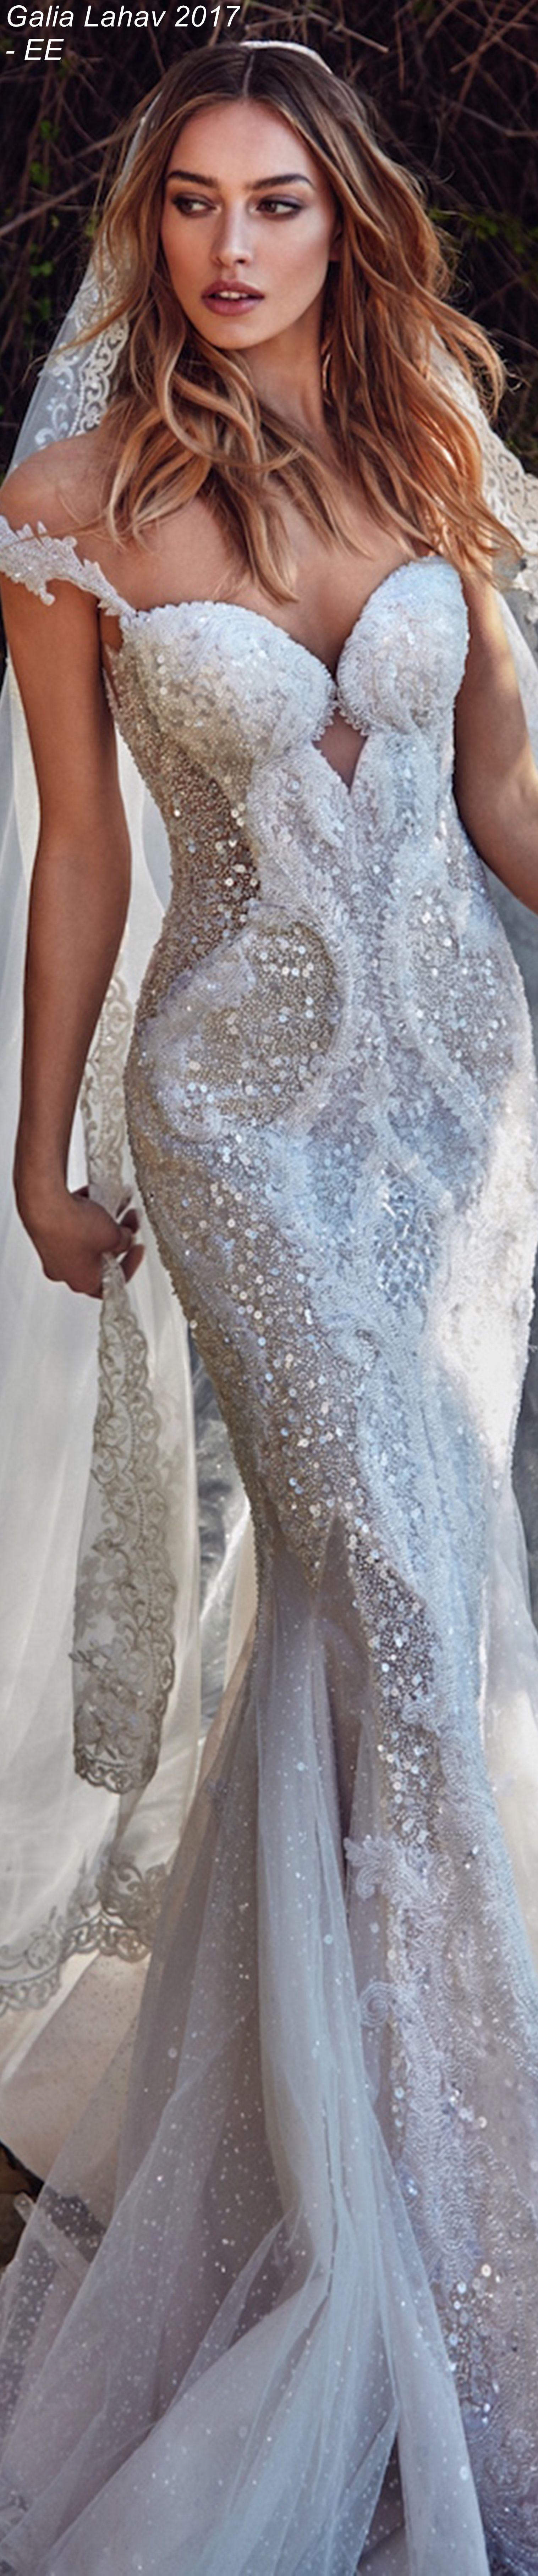 Galia Lahav 2017 EE ドレス, おしゃれ画像, おしゃれ